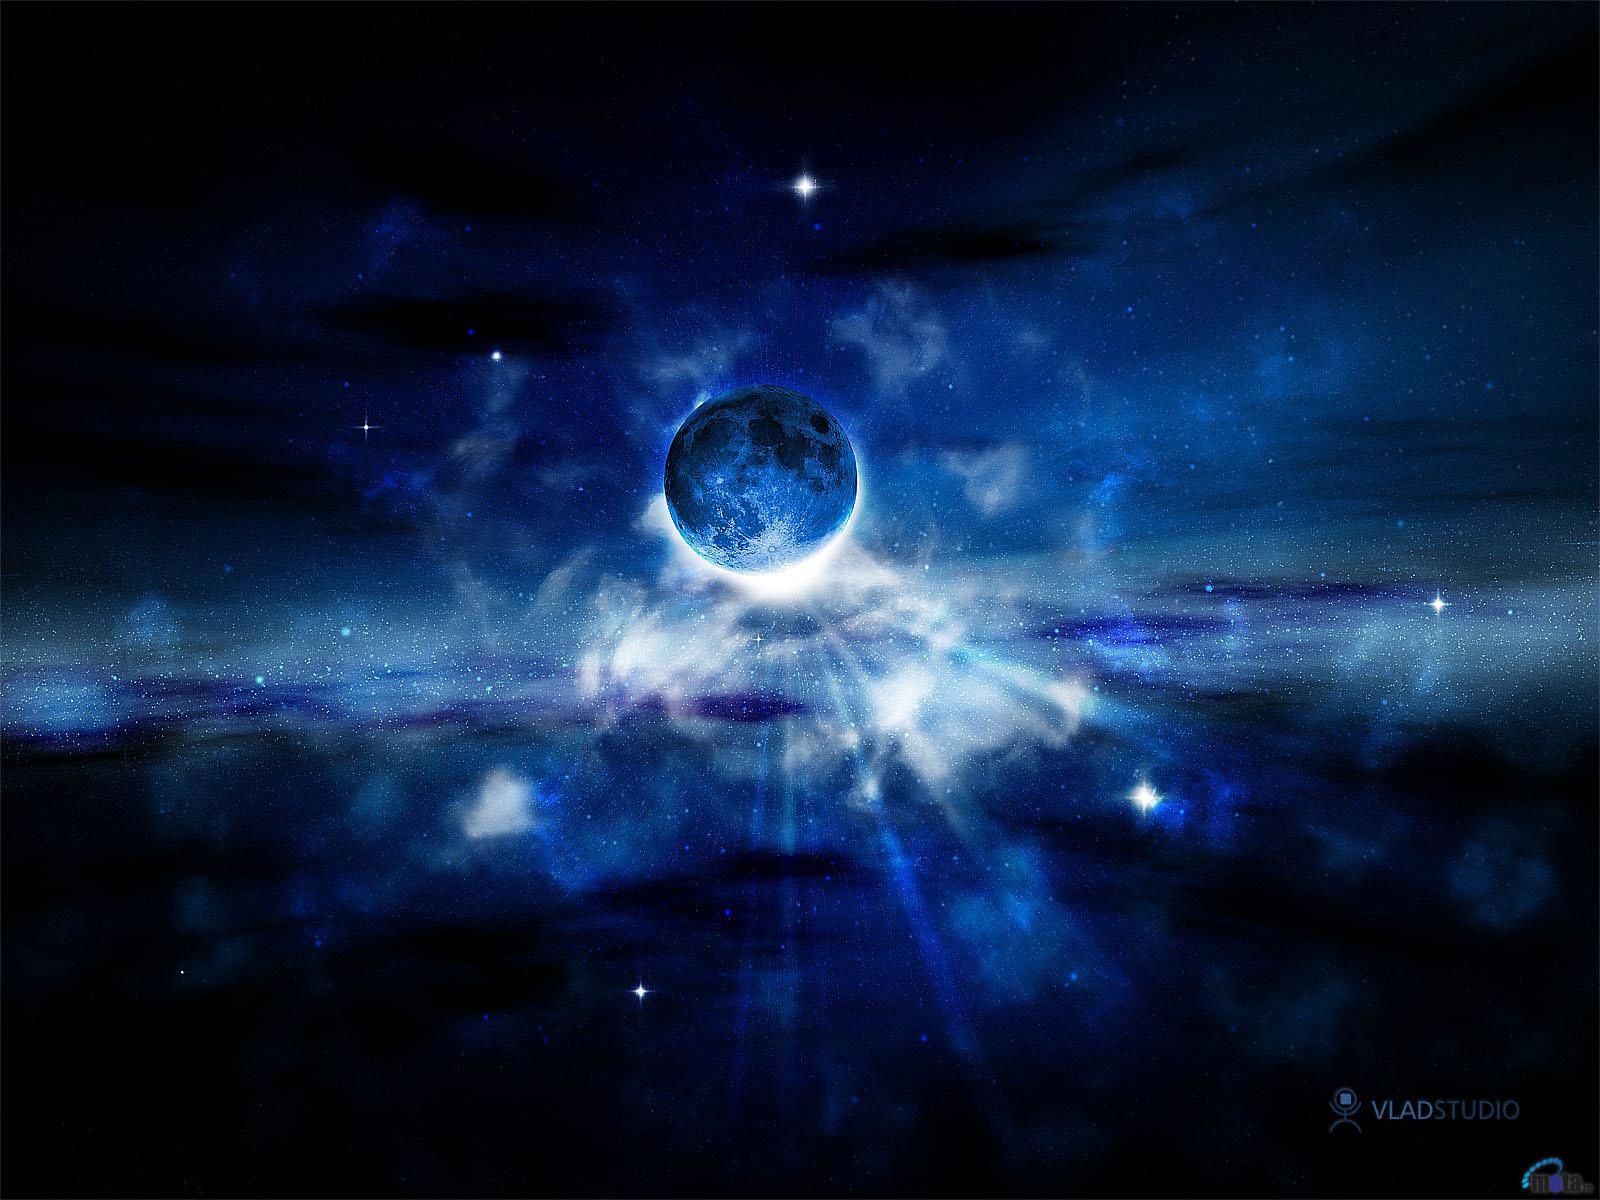 http://4.bp.blogspot.com/-Uflq9rFpwlc/USNJHtJgD7I/AAAAAAAADUA/pIgsg-Cp5w4/s1600/blue_galaxy_wallpaper-normal.jpg